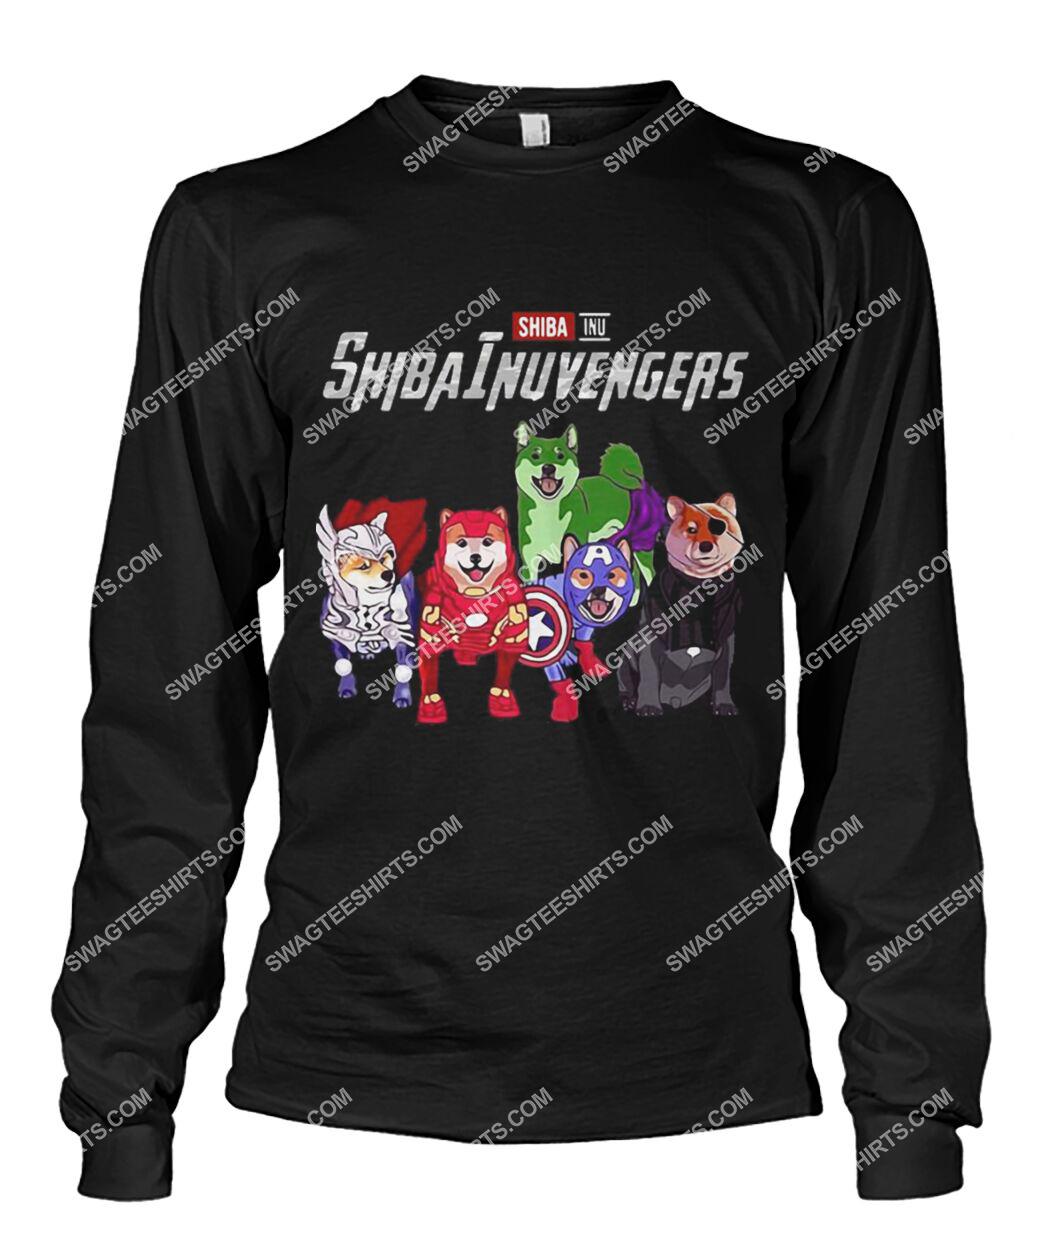 shiba inu shibainuvengers marvel avengers dogs lover sweatshirt 1